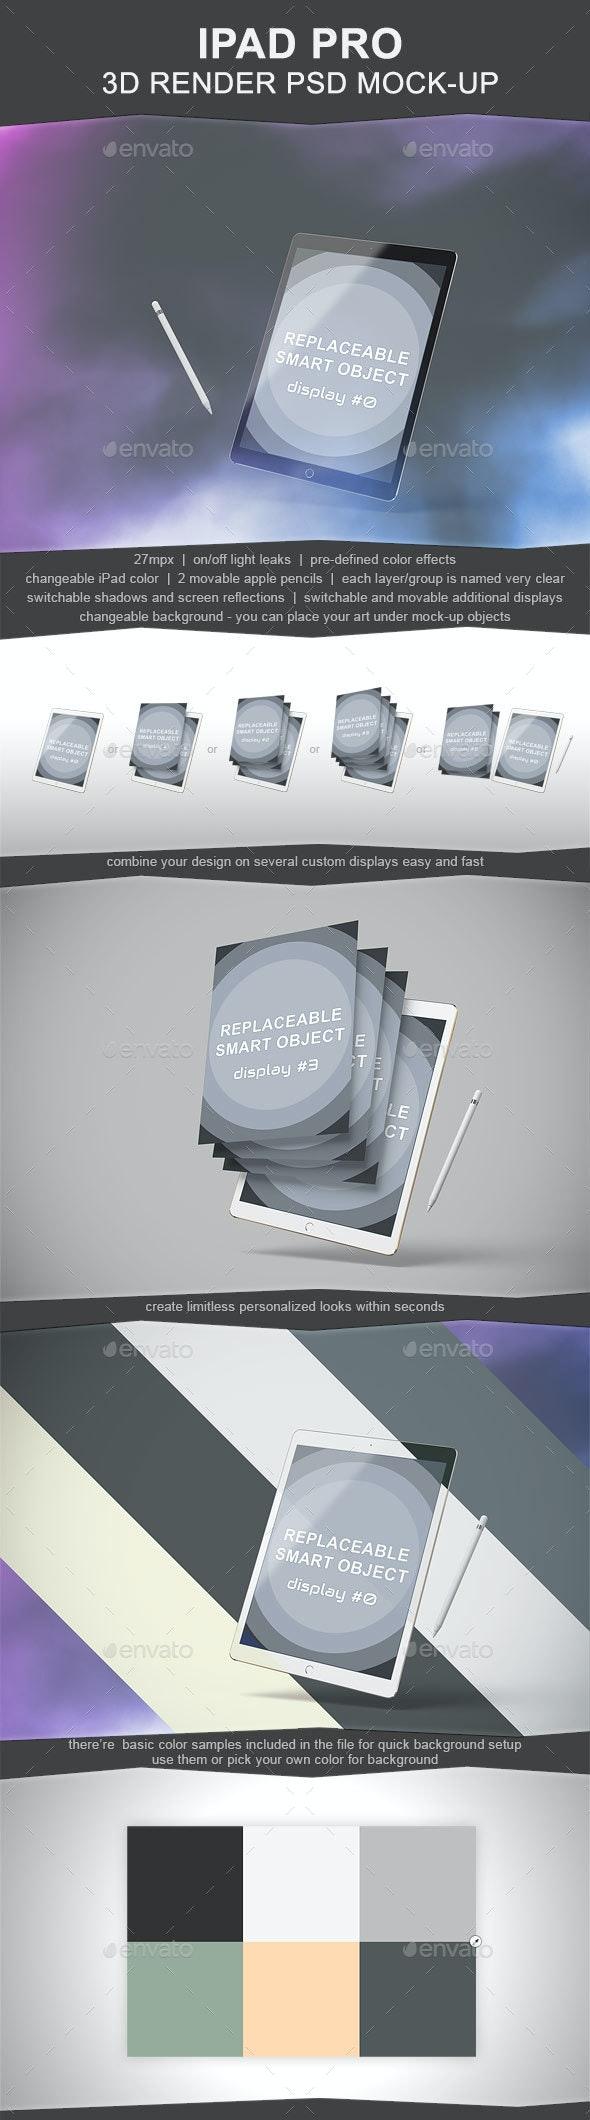 Ipad Pro 3D Render Mockup - Mobile Displays